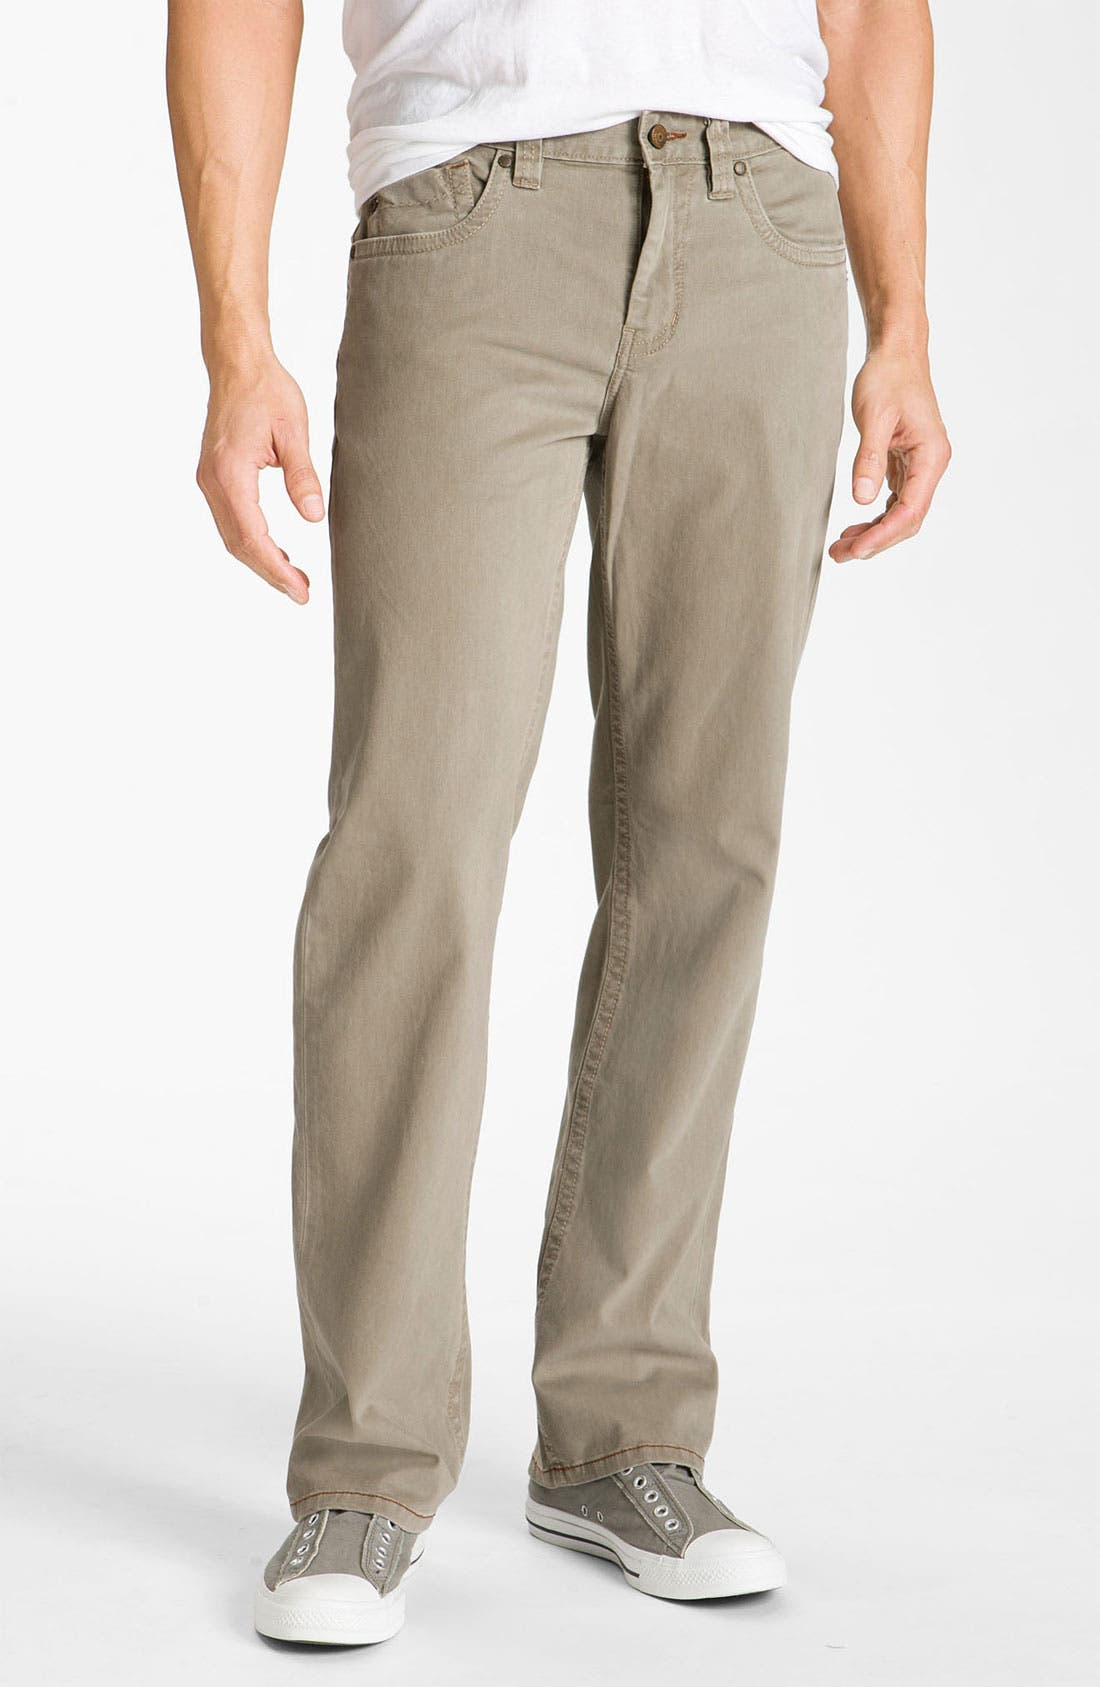 Main Image - Tommy Bahama Denim 'Twill Smith' Standard Fit Pants (Big & Tall)